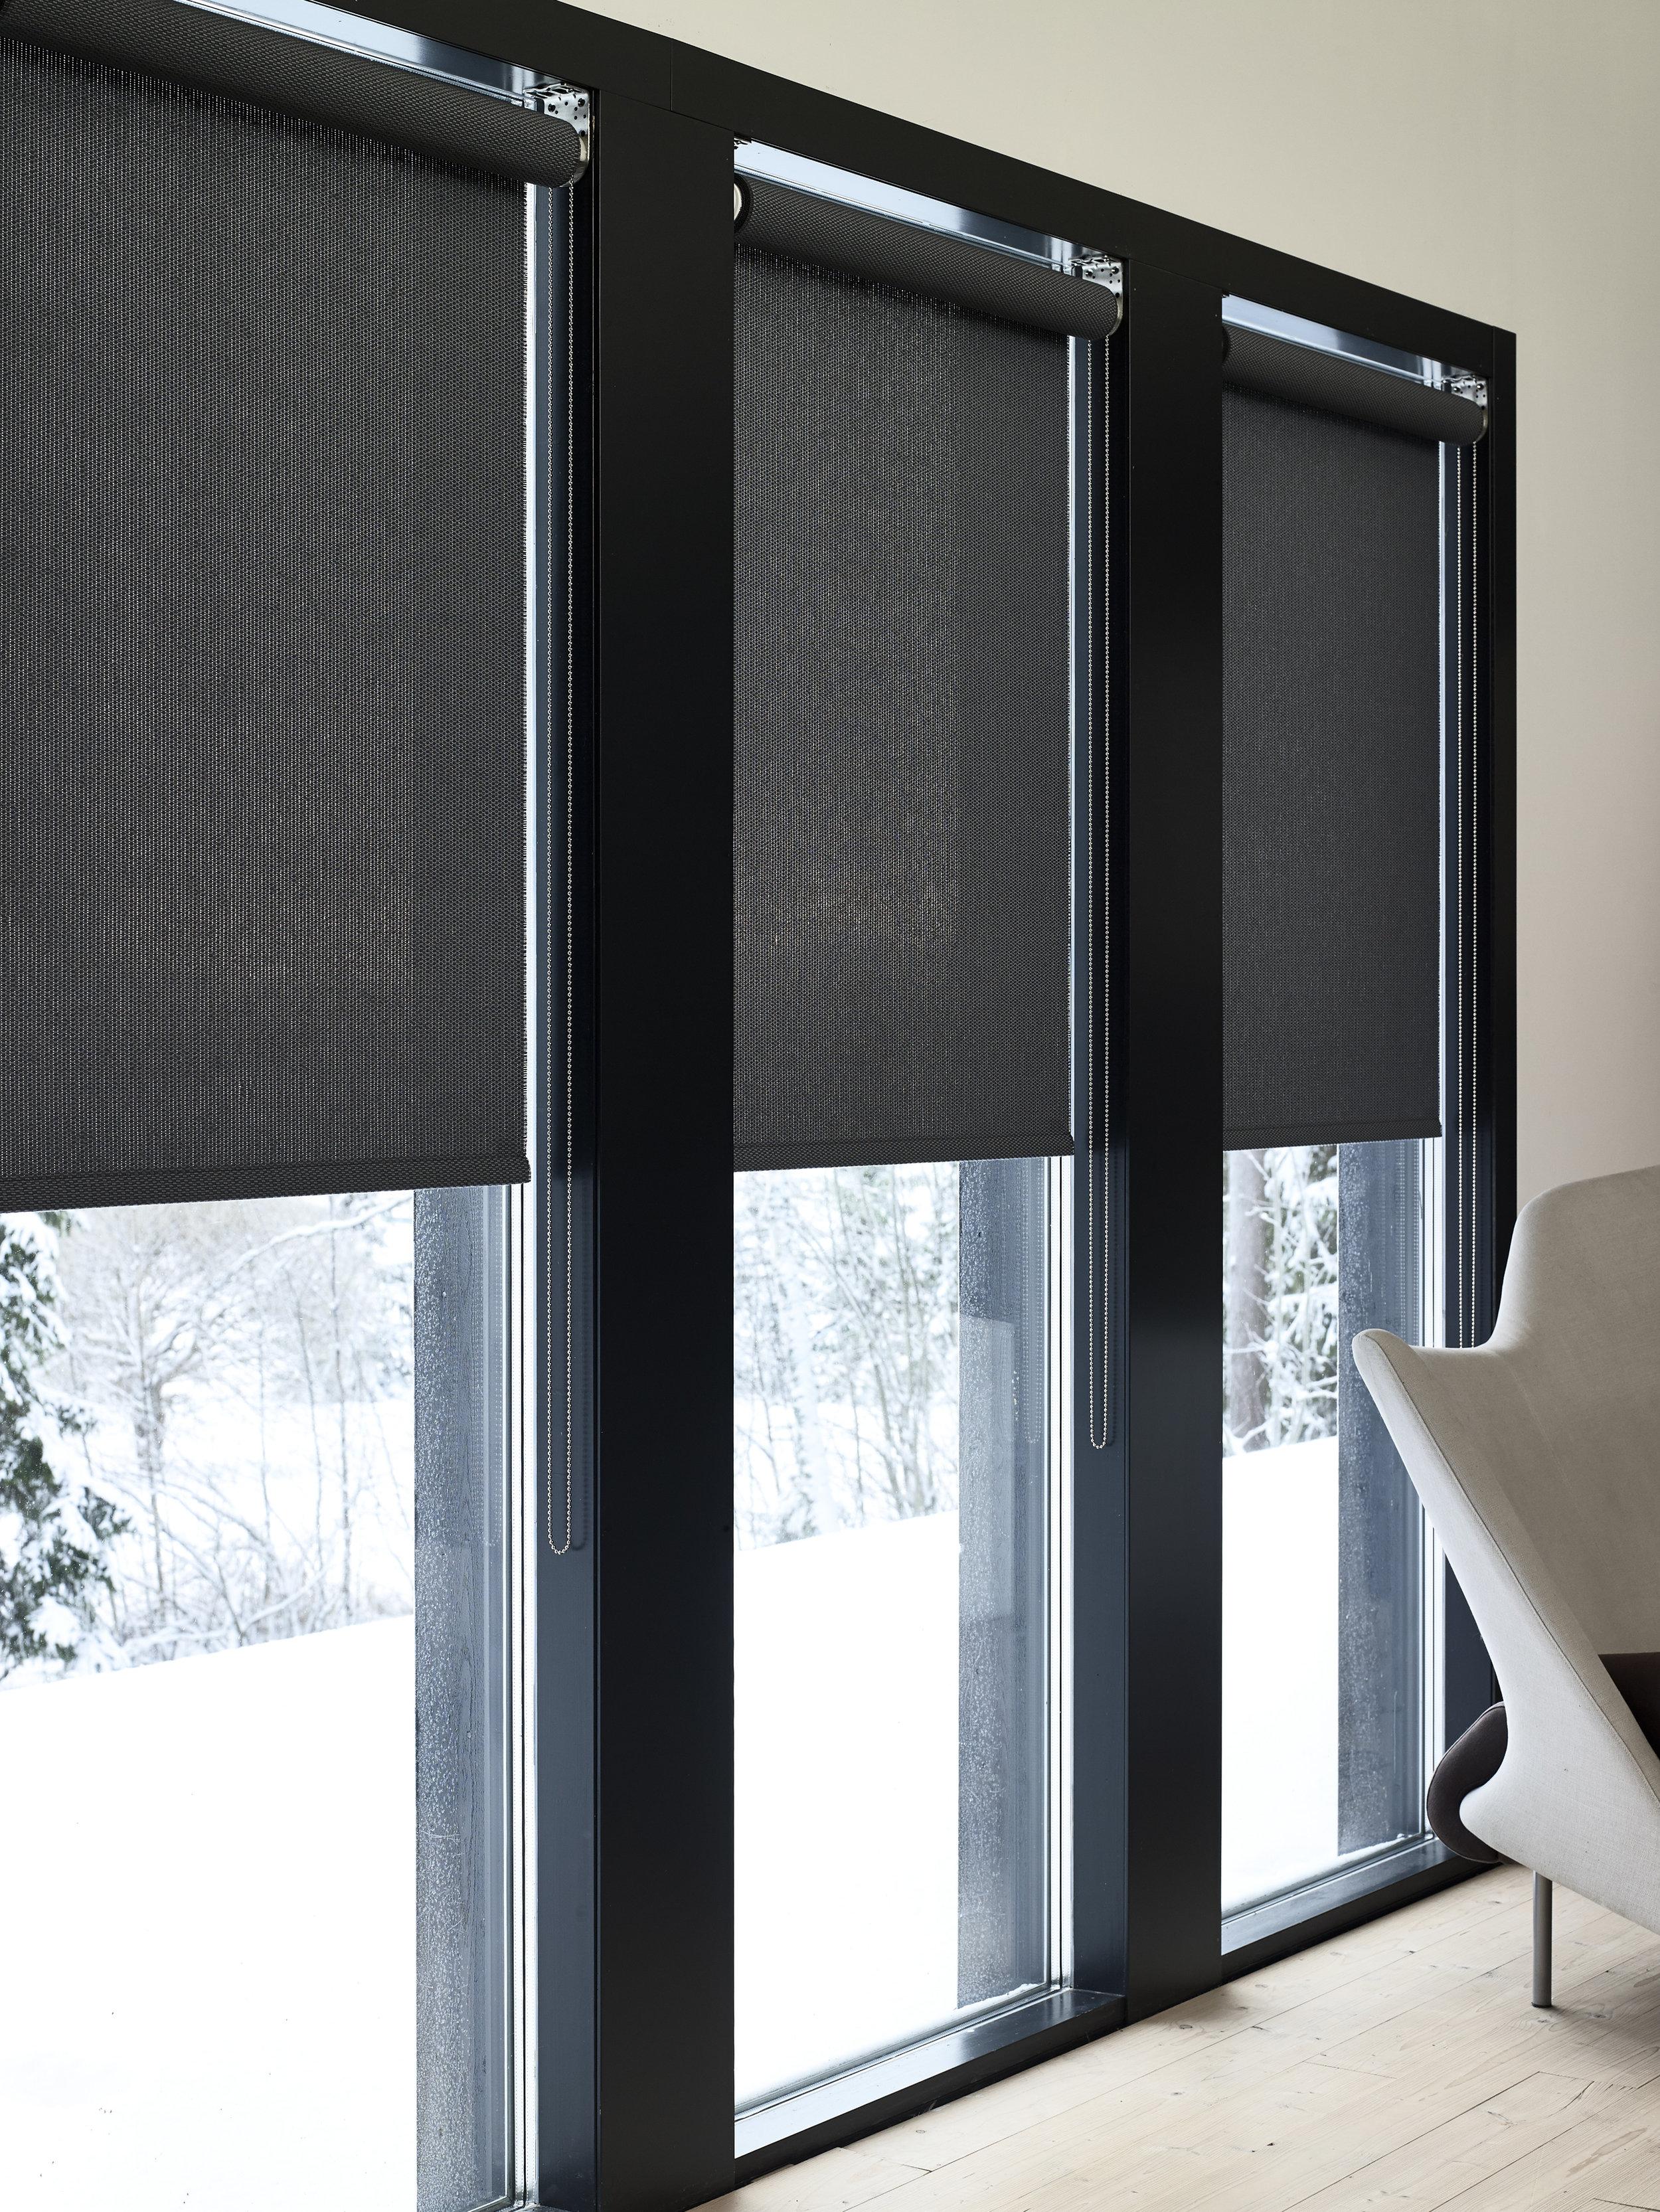 21199  Morning  black roller blinds